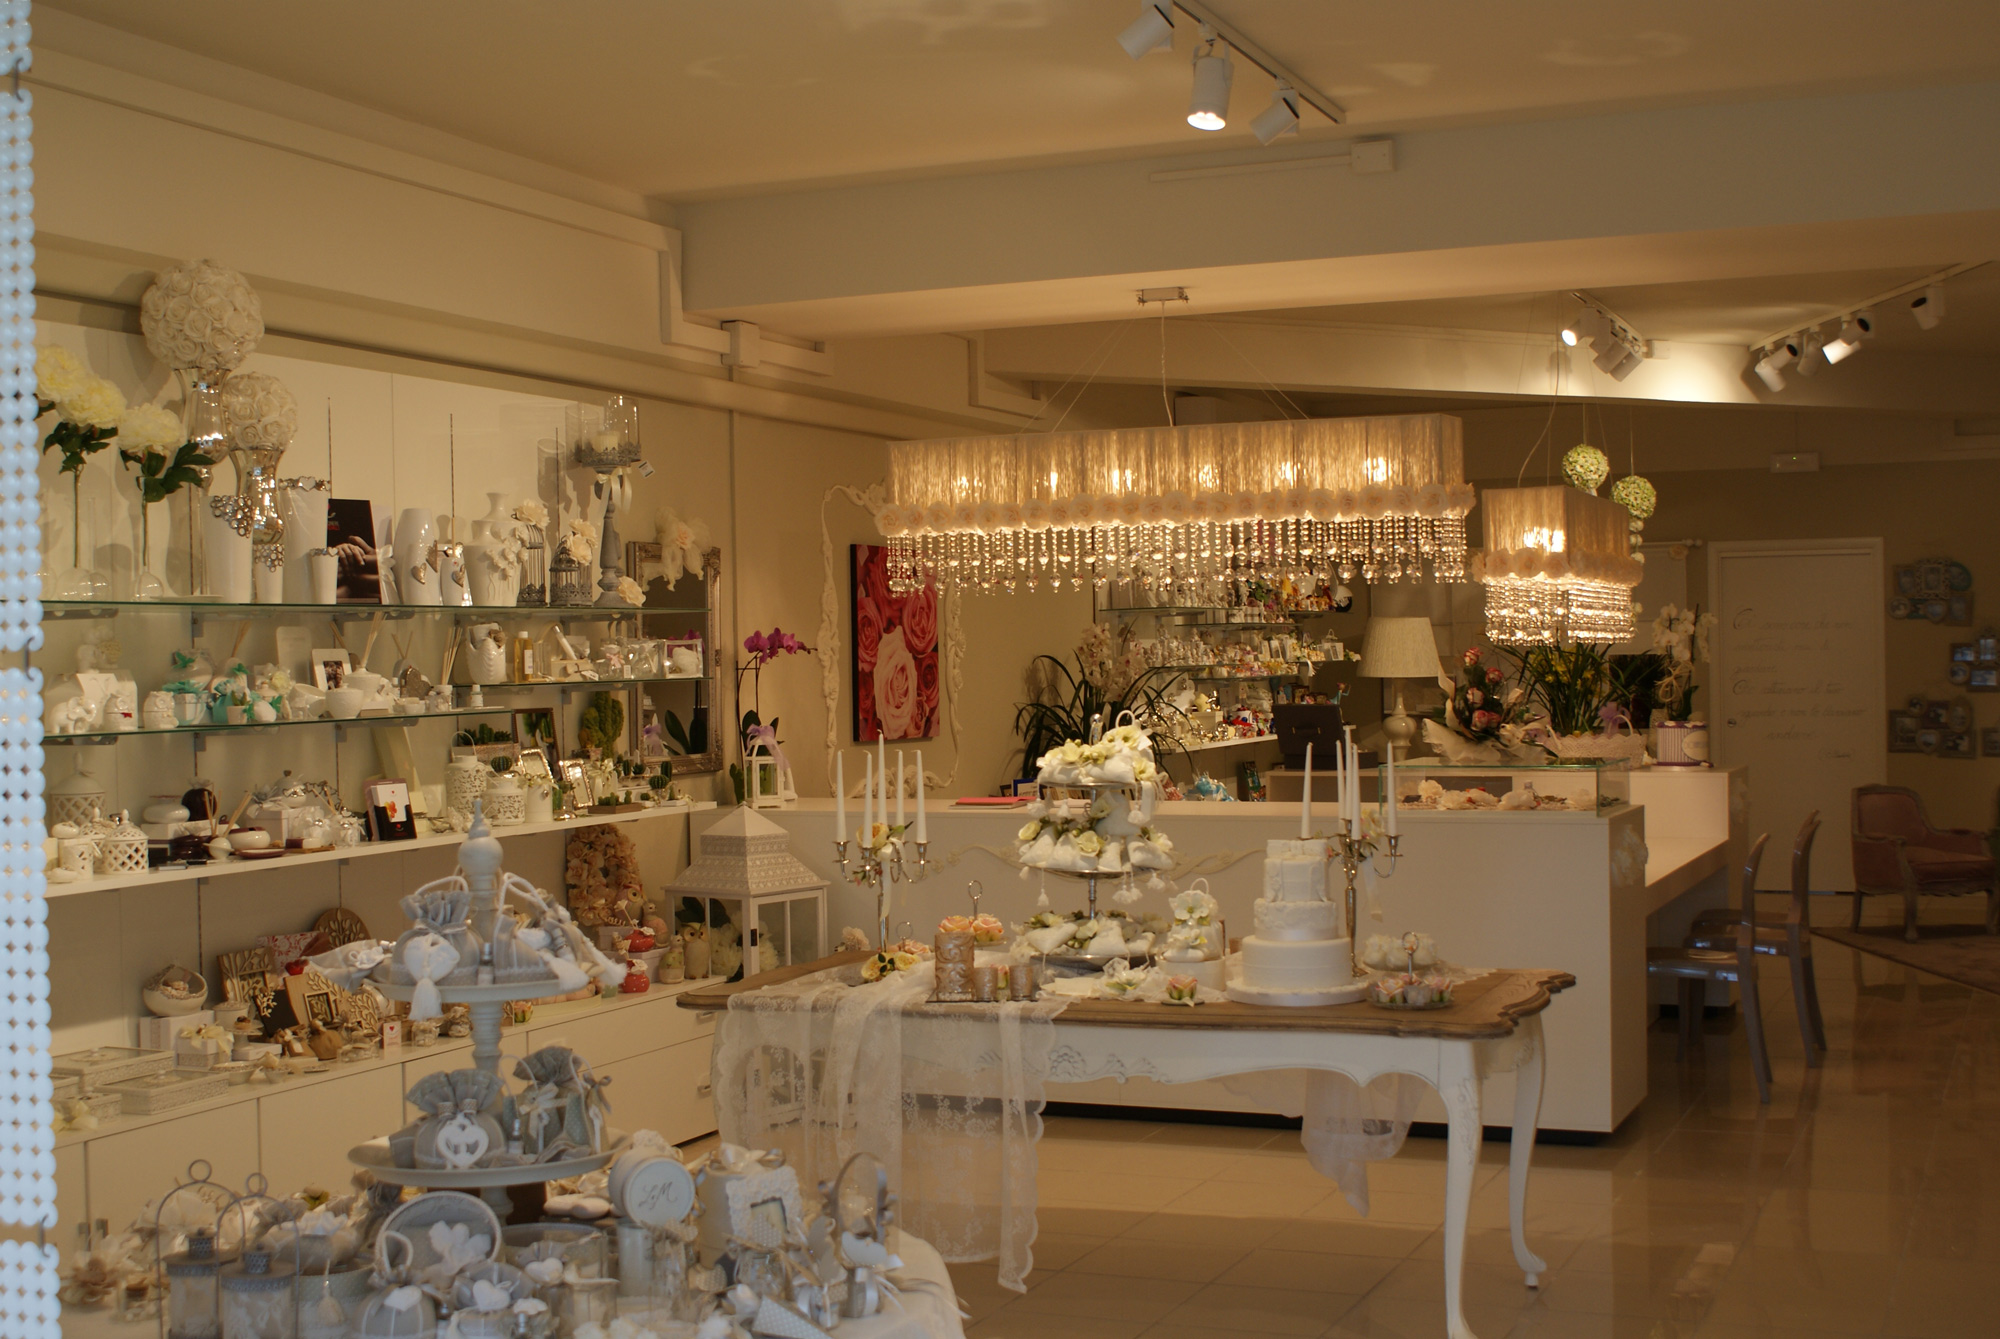 Arredamento per negozi di bomboniere toscana belardi for Negozi arredamento